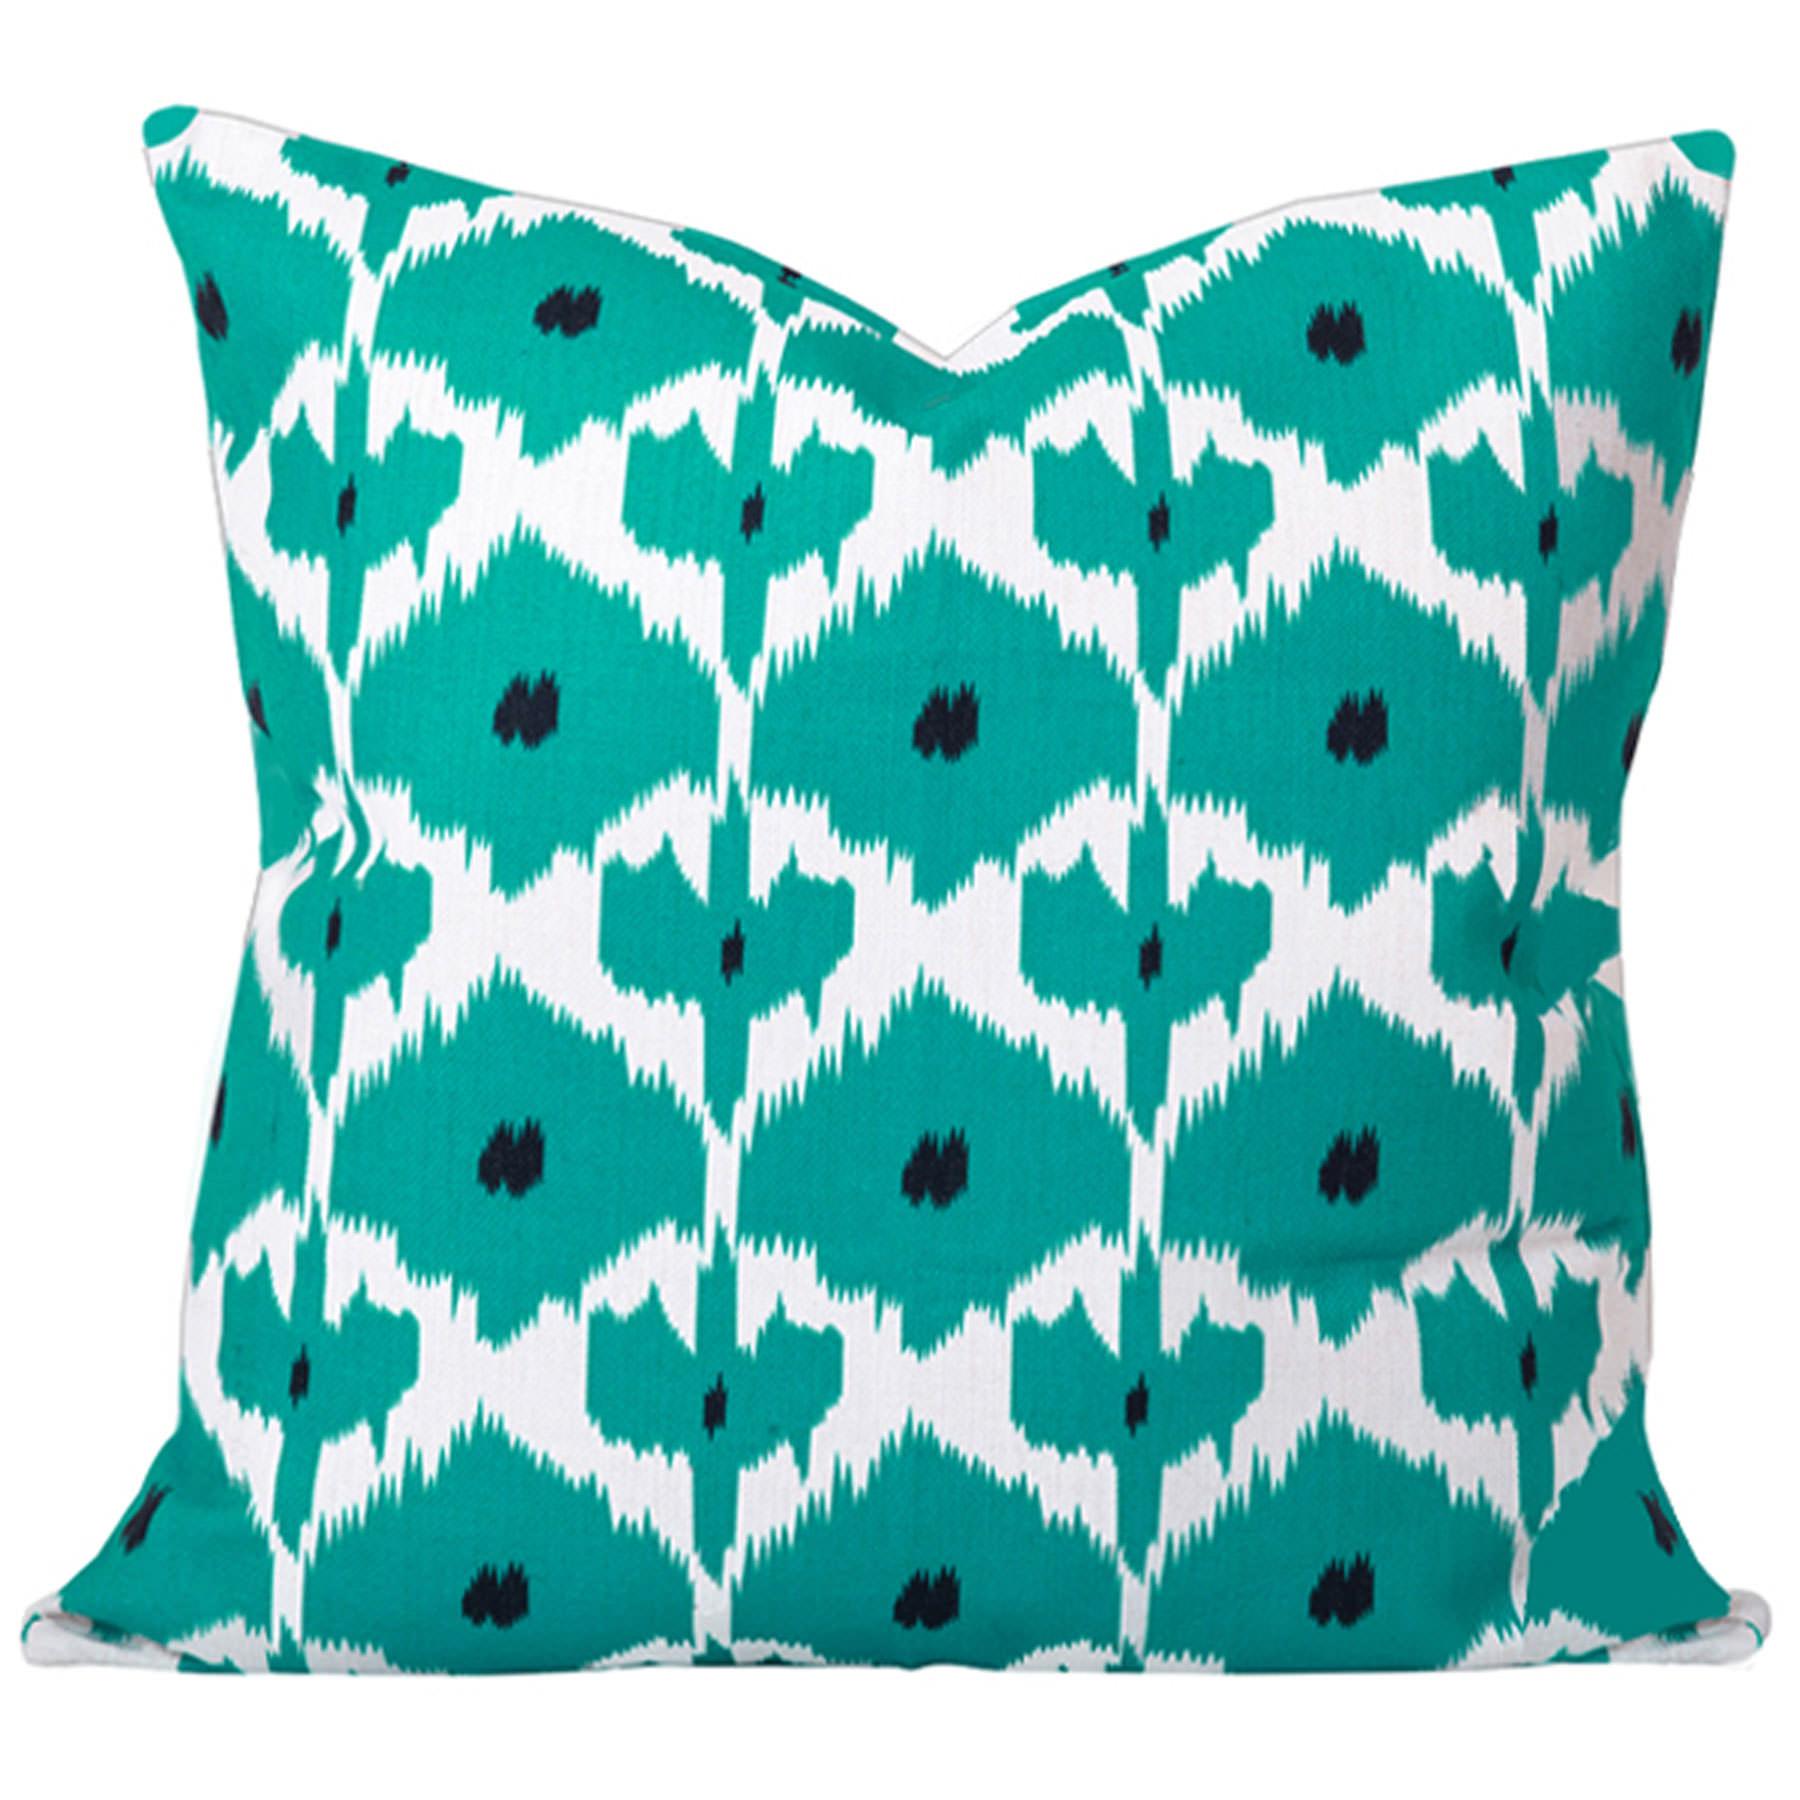 Kristine-Turquoise-Ikat-Cushion